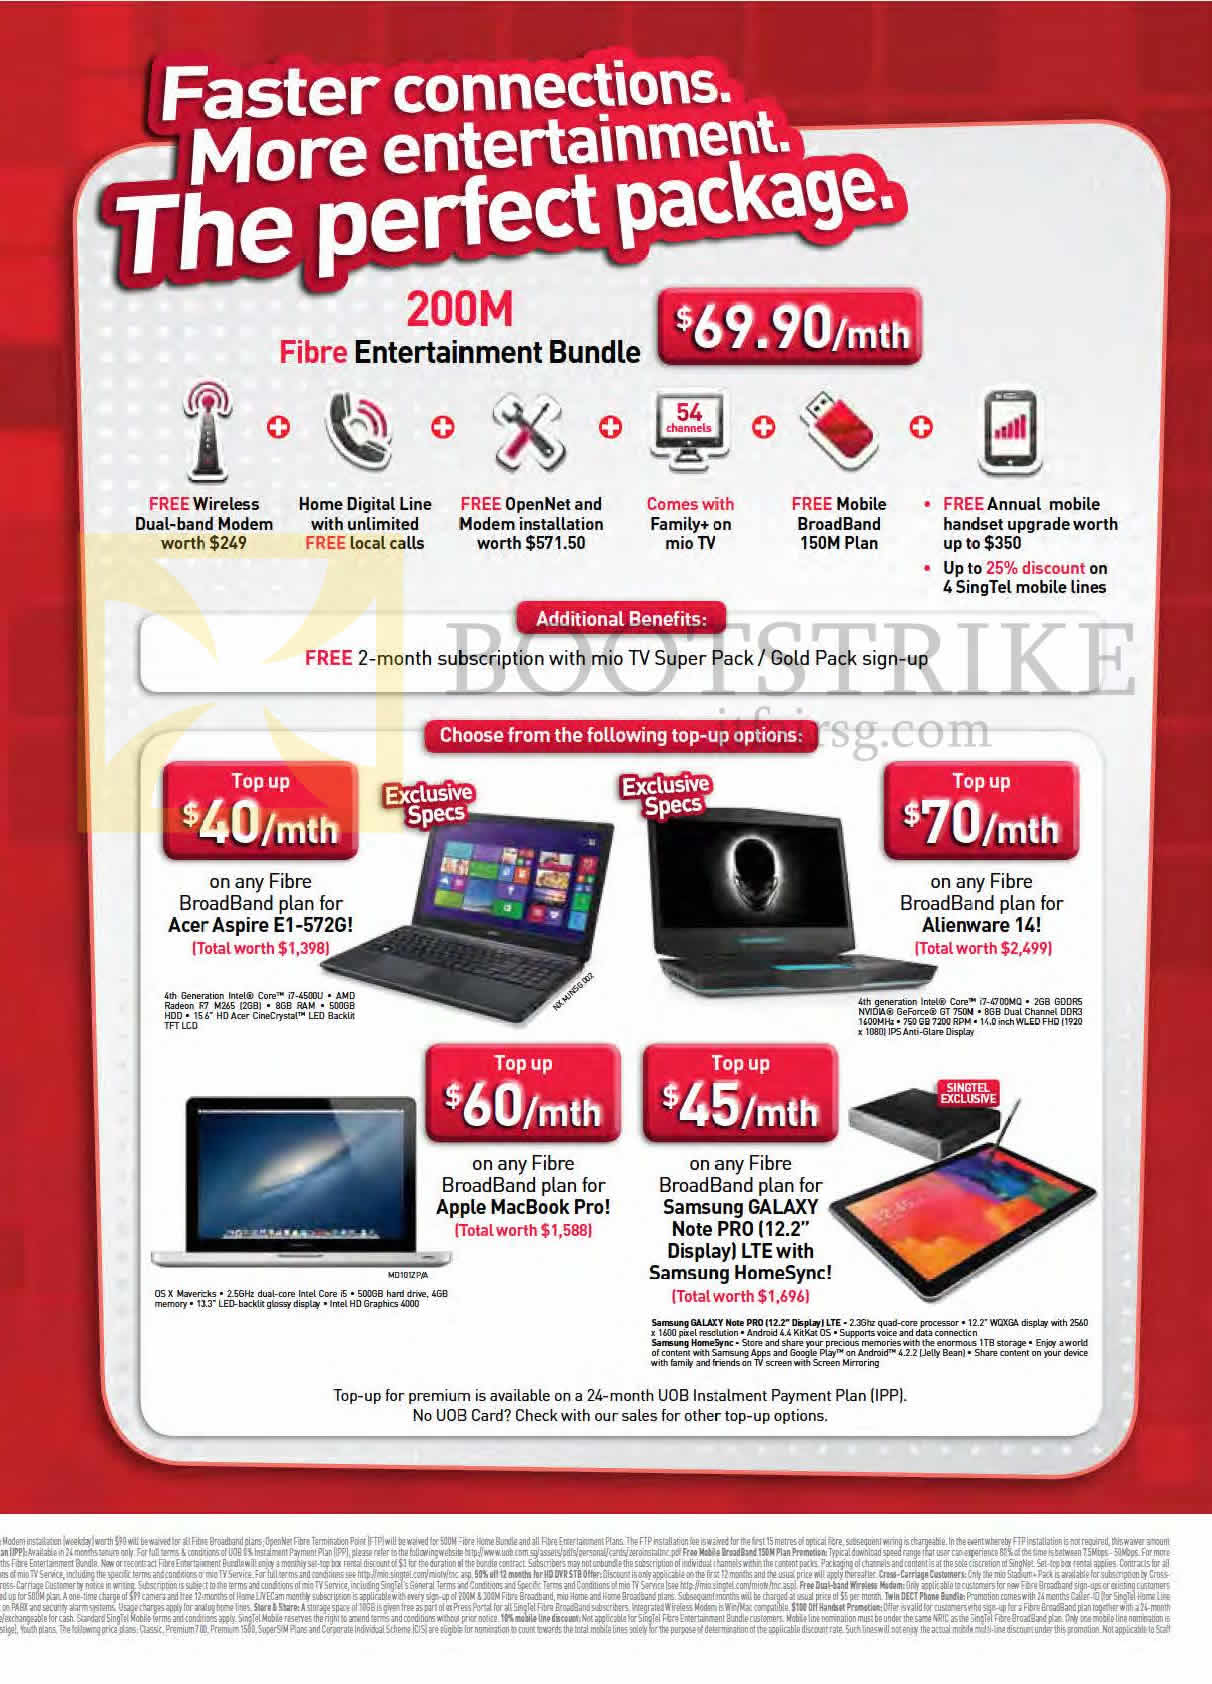 Broadband 200Mbps Fibre Entertainment Bundle, Notebooks Acer Aspire E1-572G, Dell Alienware 14, Apple Macbook Pro, Samsung Galaxy Note Pro